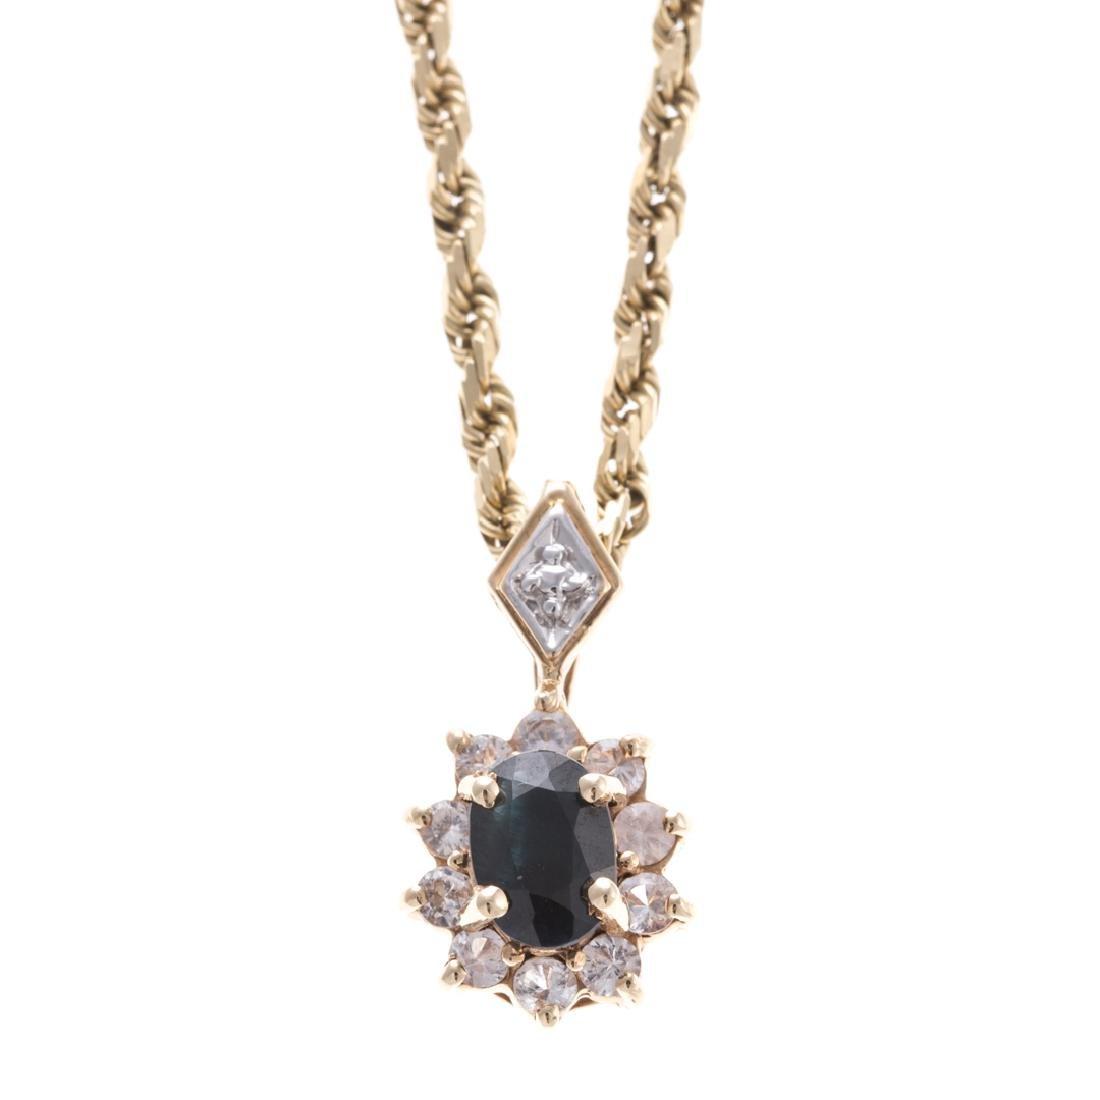 A Lady's Sapphire & Diamond Pendant in Gold